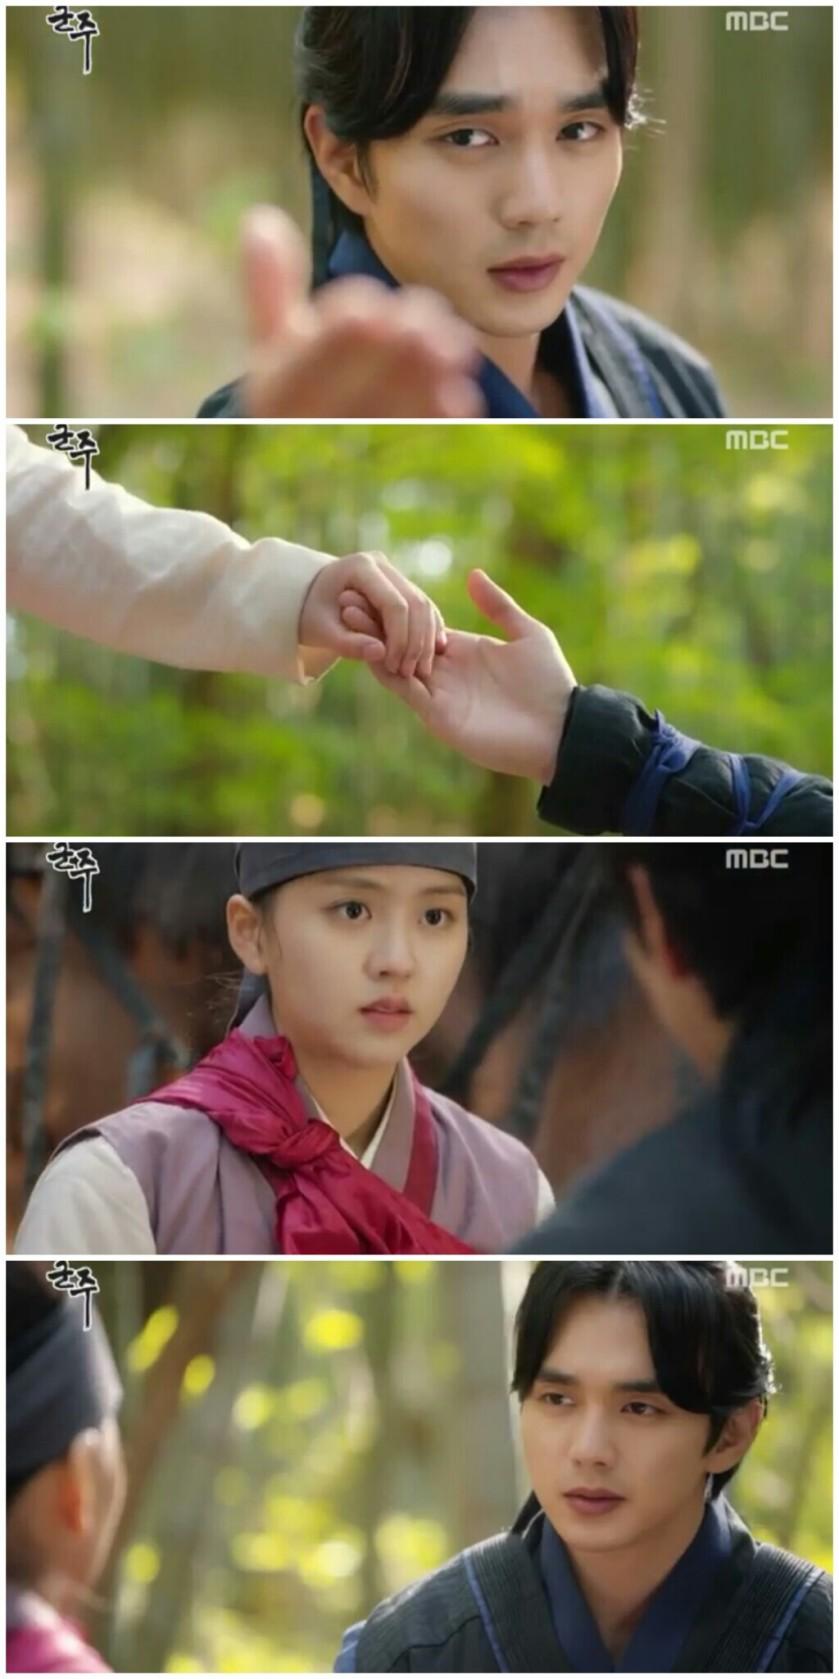 Ruler Masterof the Mask Episode 11 12 kim so hyun